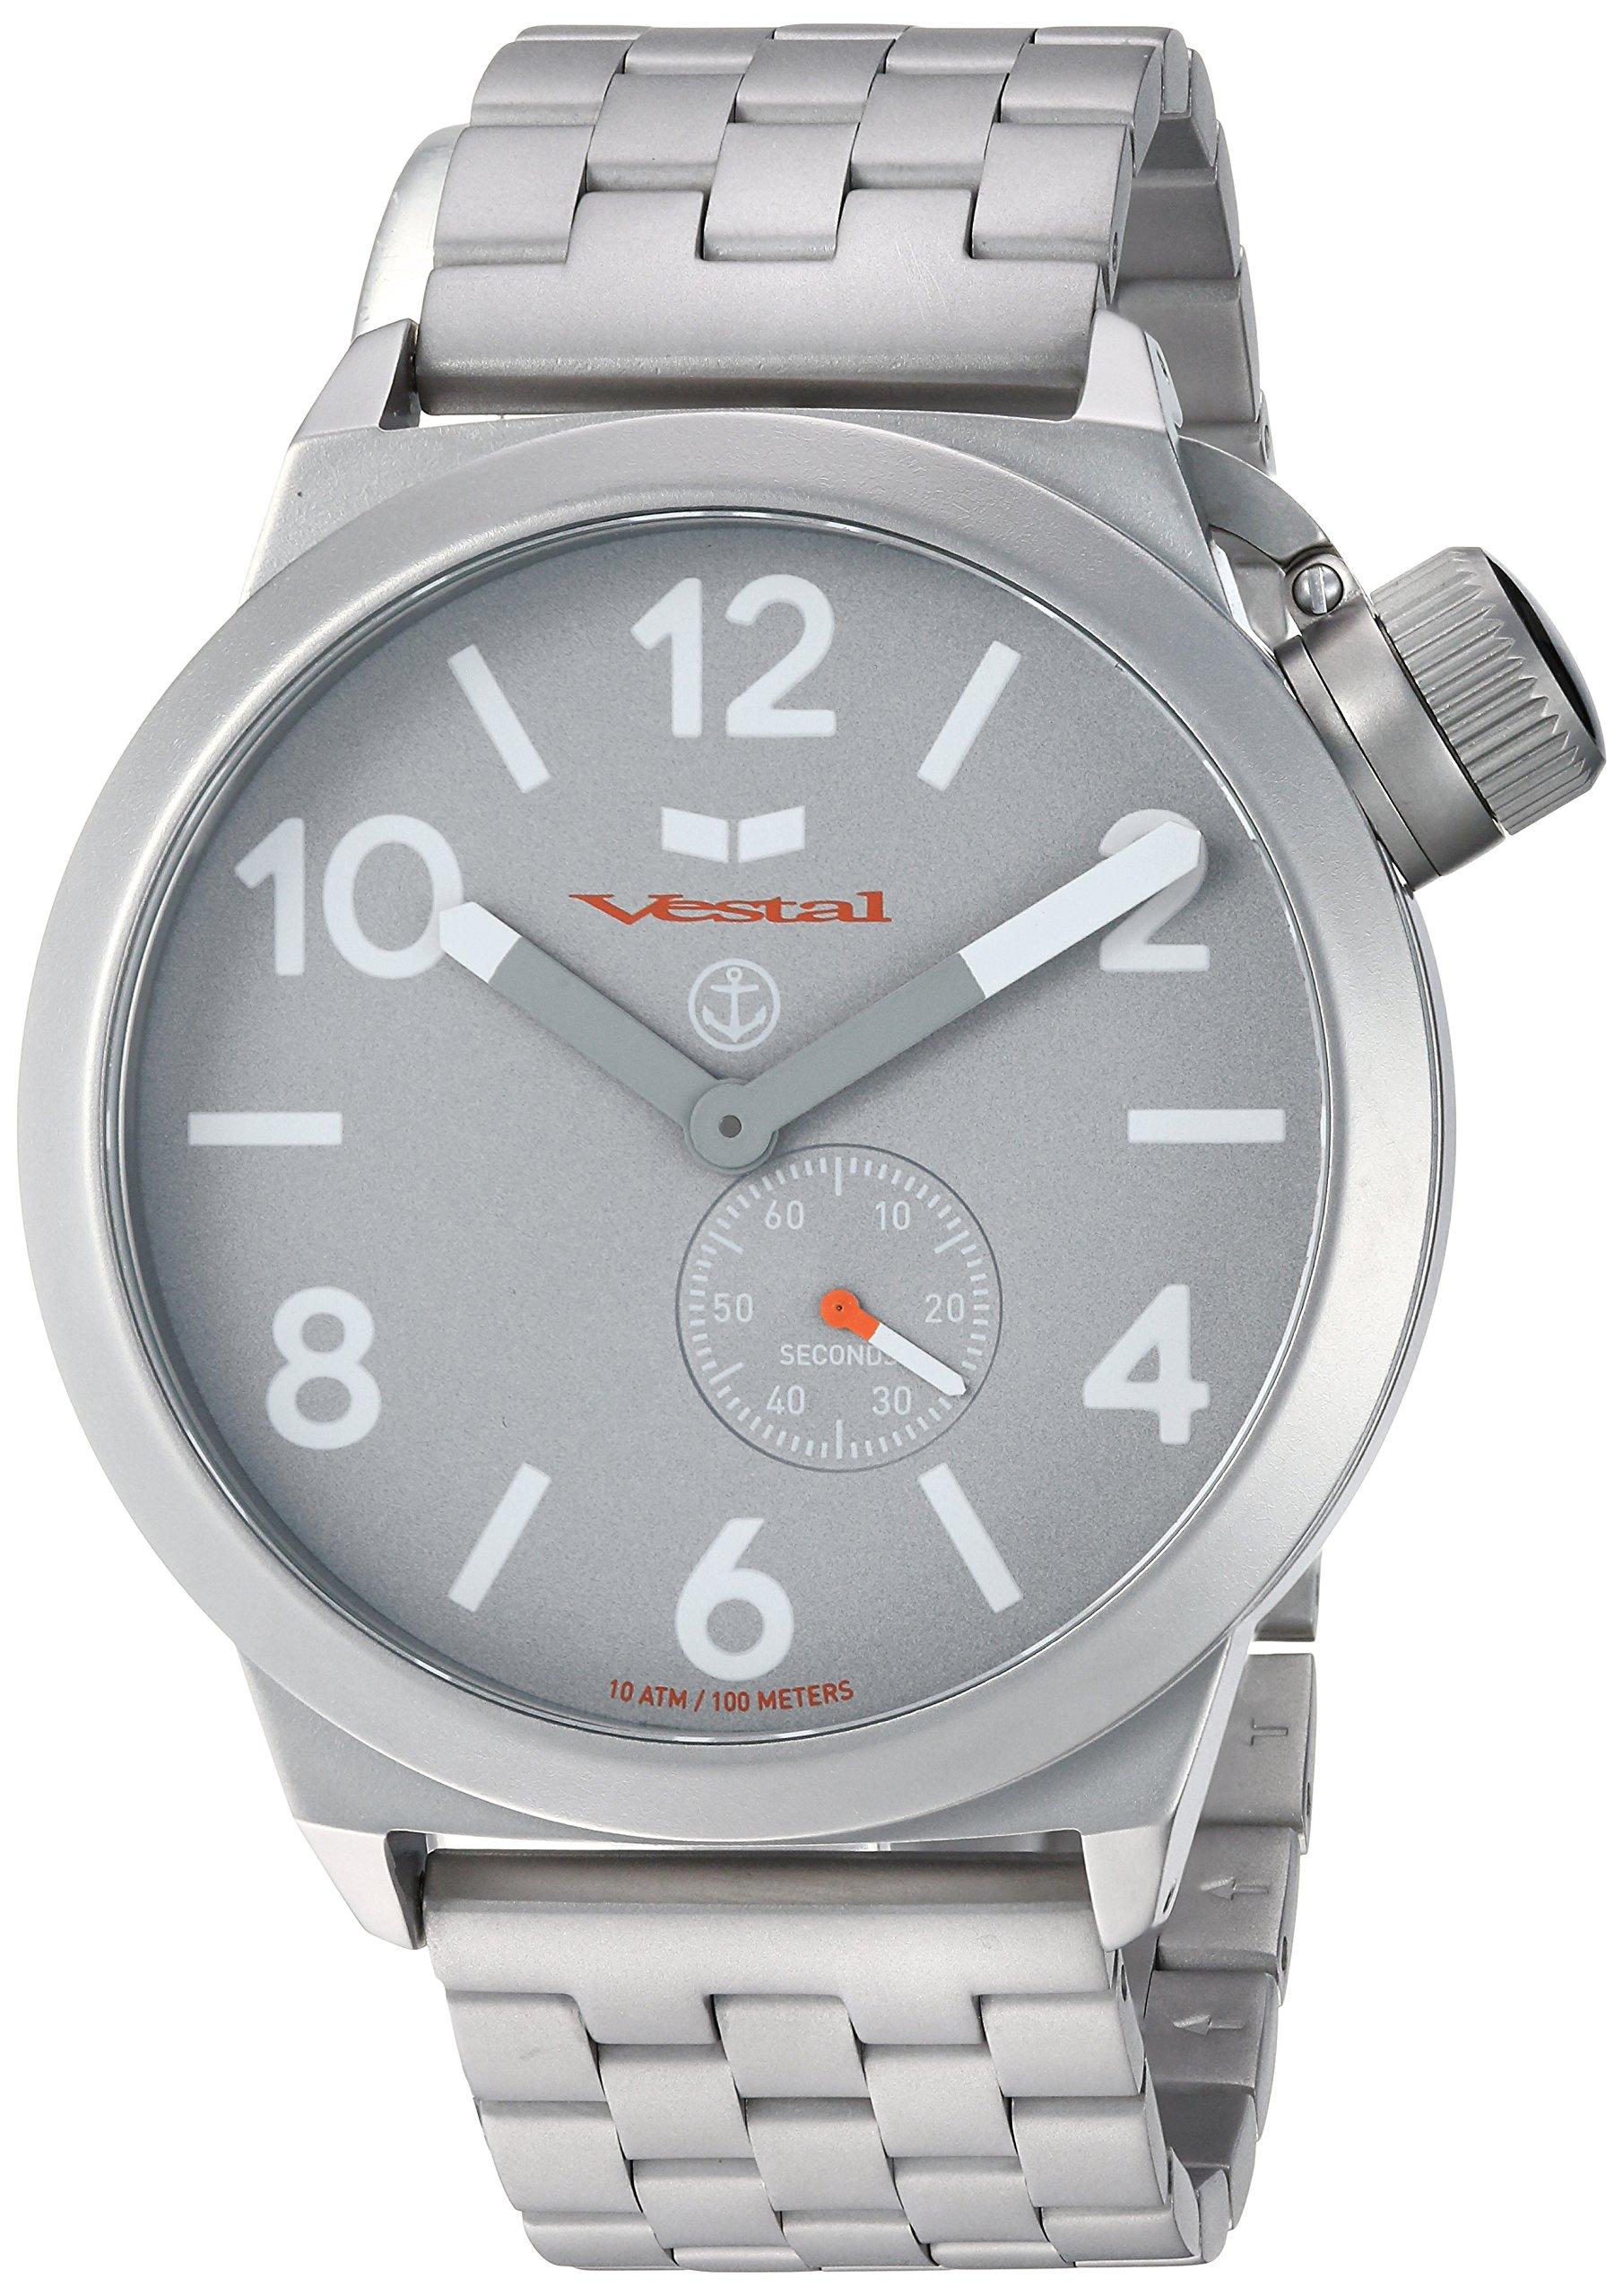 Vestal Unisex CNT453M09.5SVM Canteen Metal Analog Display Analog Quartz Silver Watch